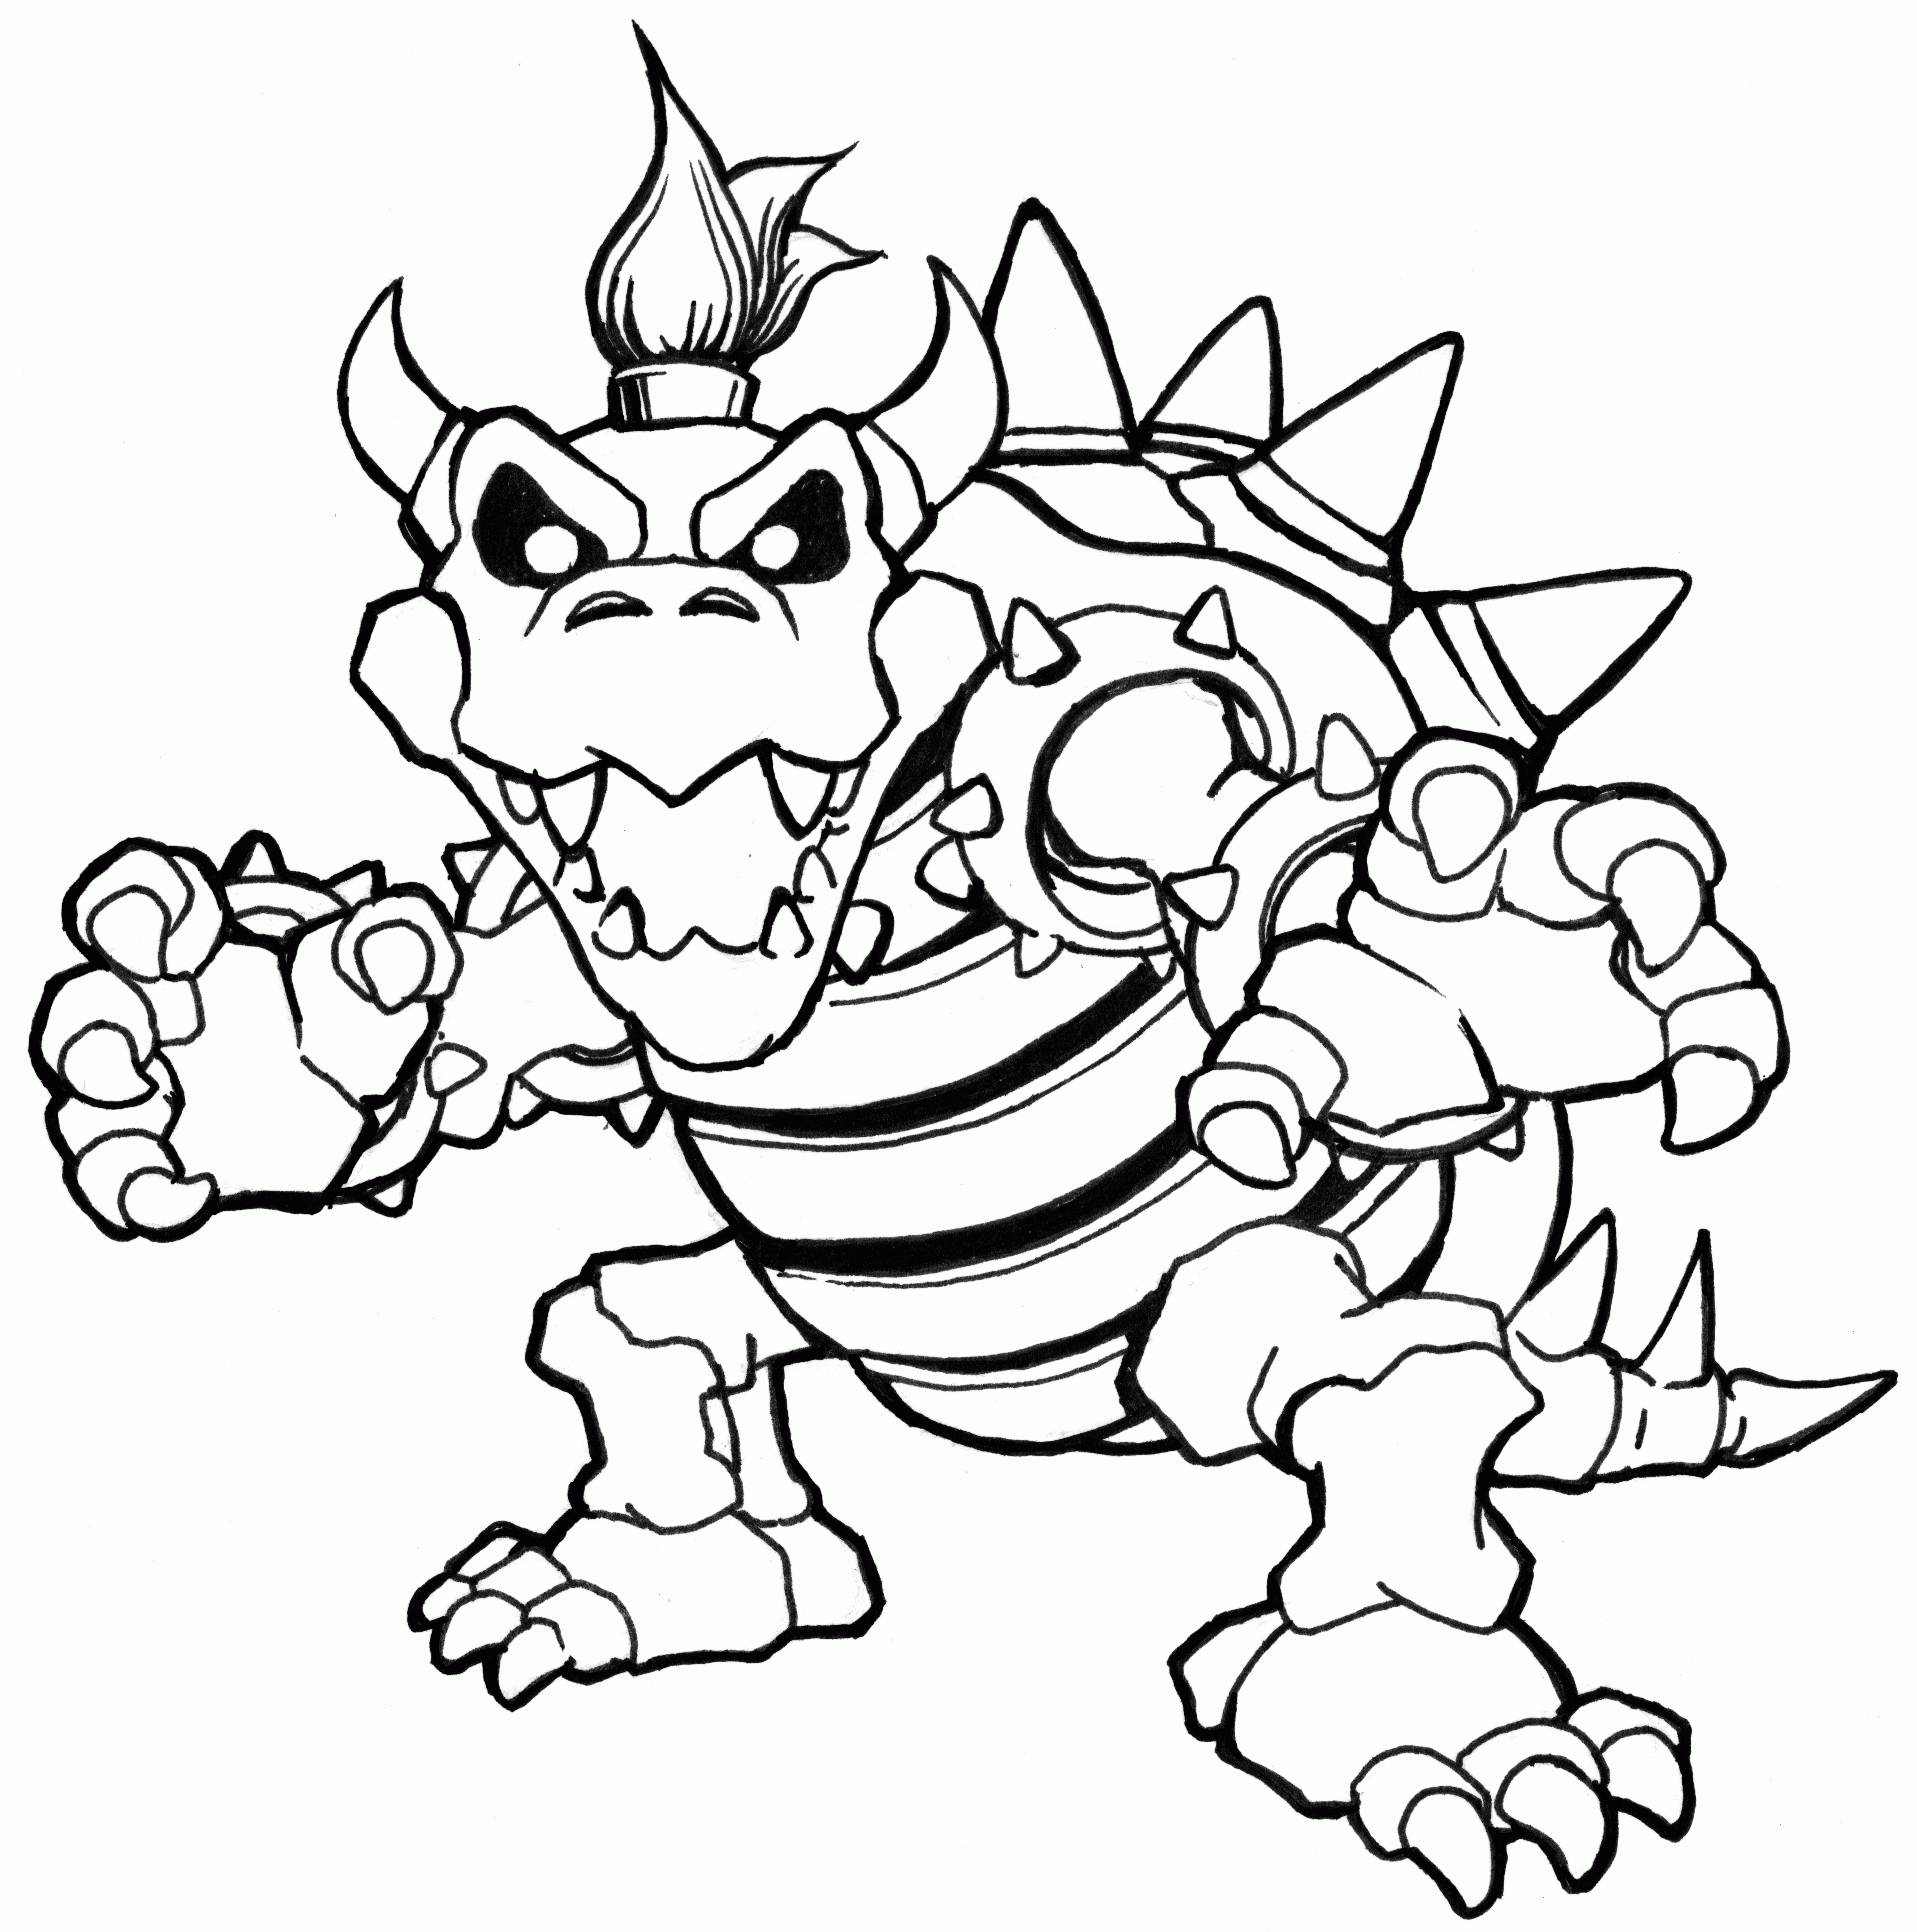 7000x7053 Bowser Coloring Pages Elegant Mario Bowser Jr Coloring Pages